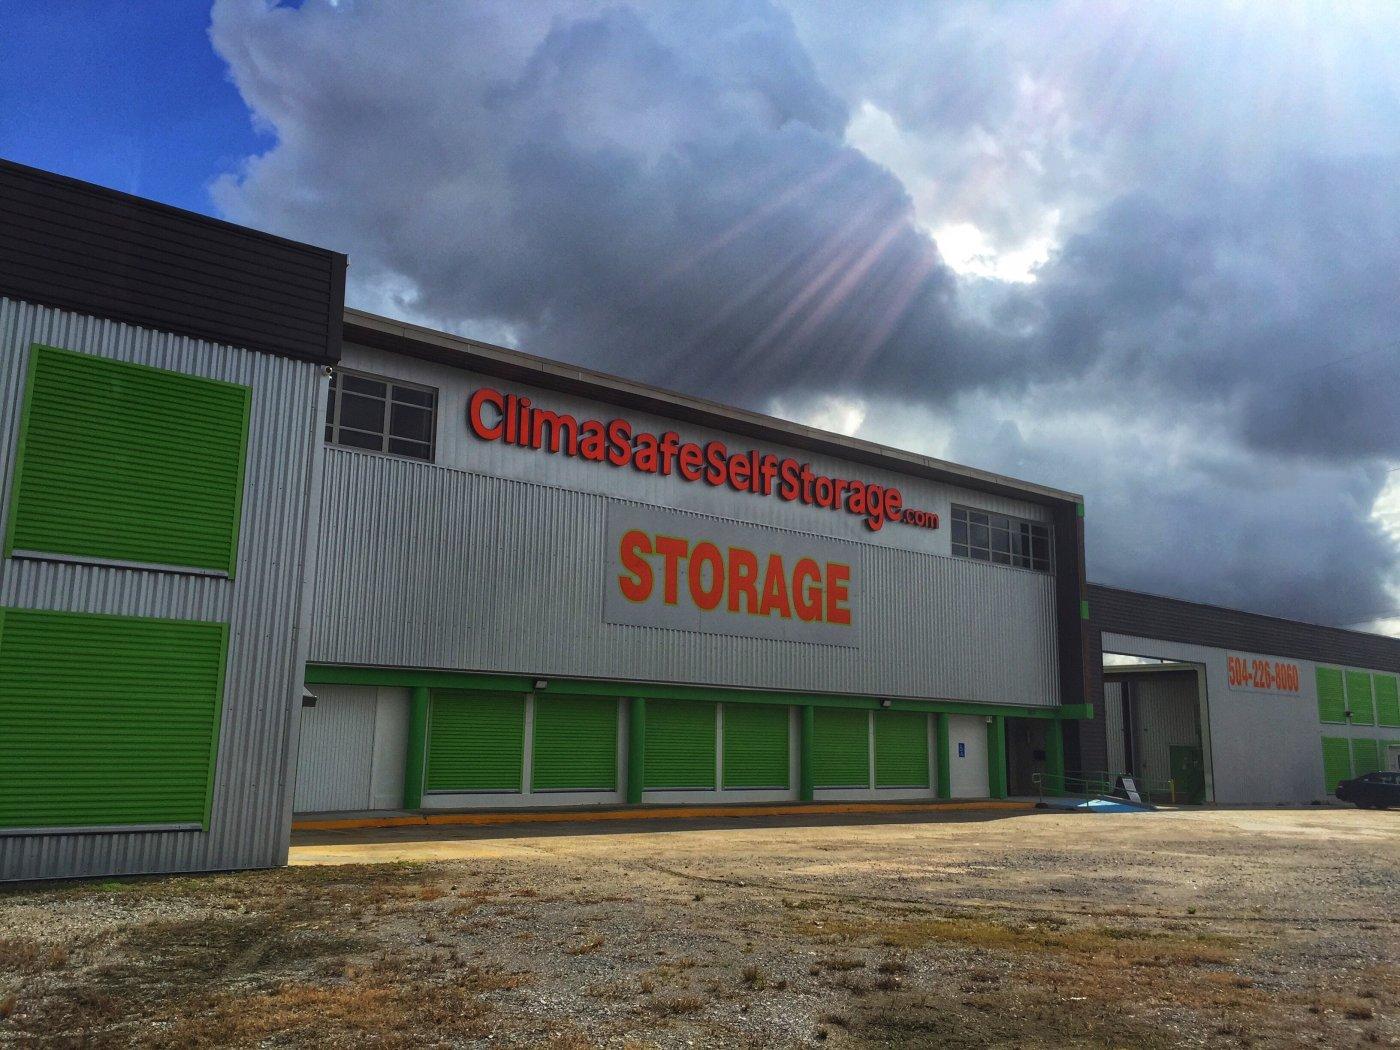 Secure Self Storage in New Orleans, LA